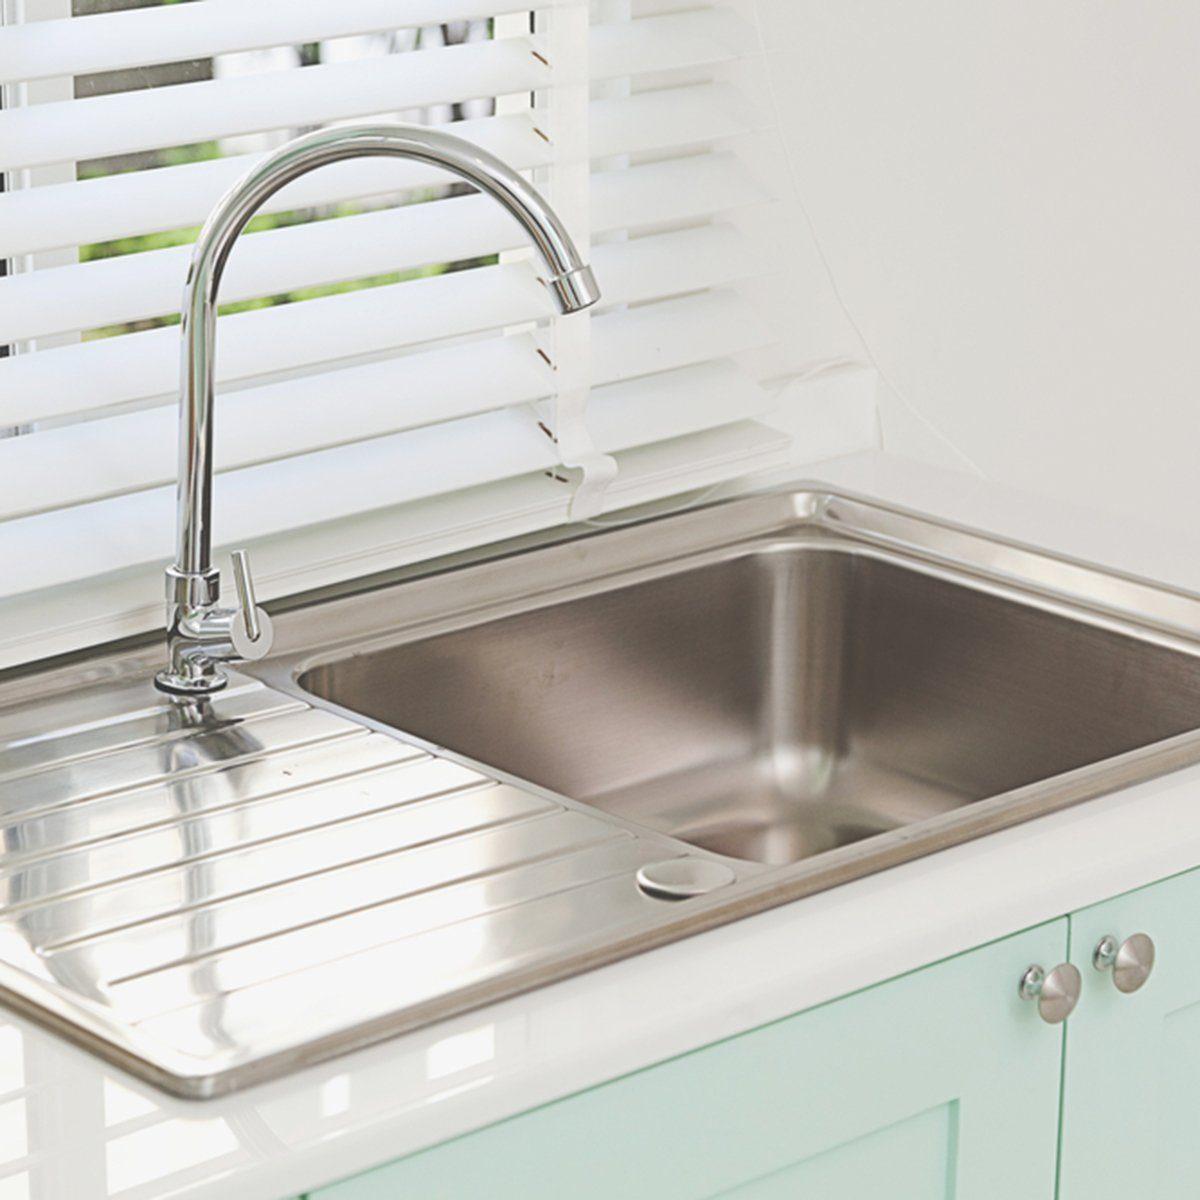 Modern kitchen sink, green tone; Shutterstock ID 507453130